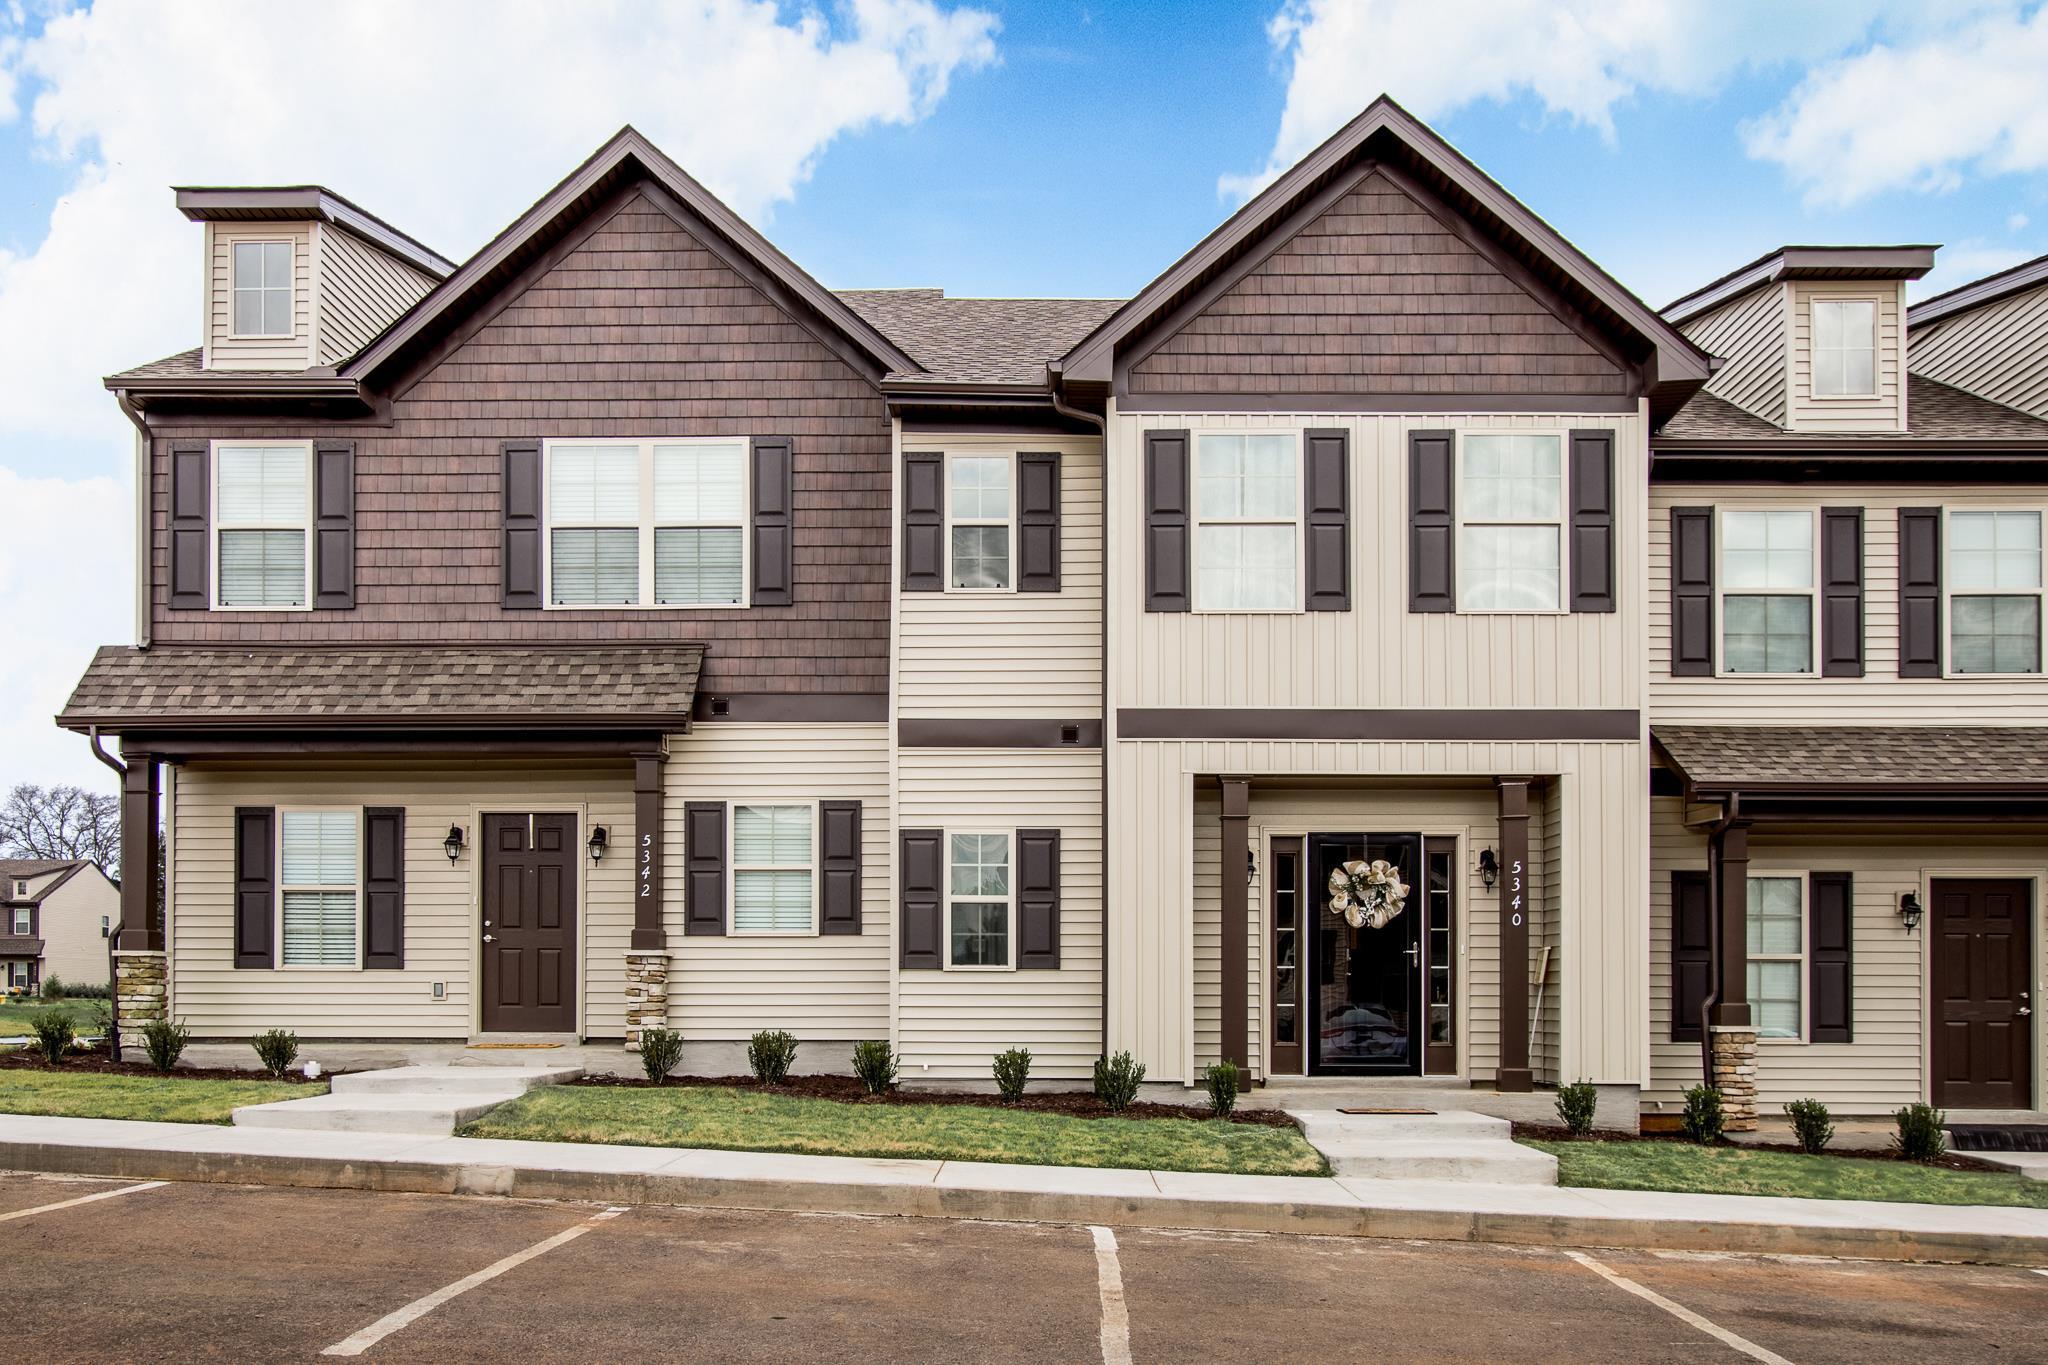 Murfreesboro homes 100k 200k for Two story homes under 200k